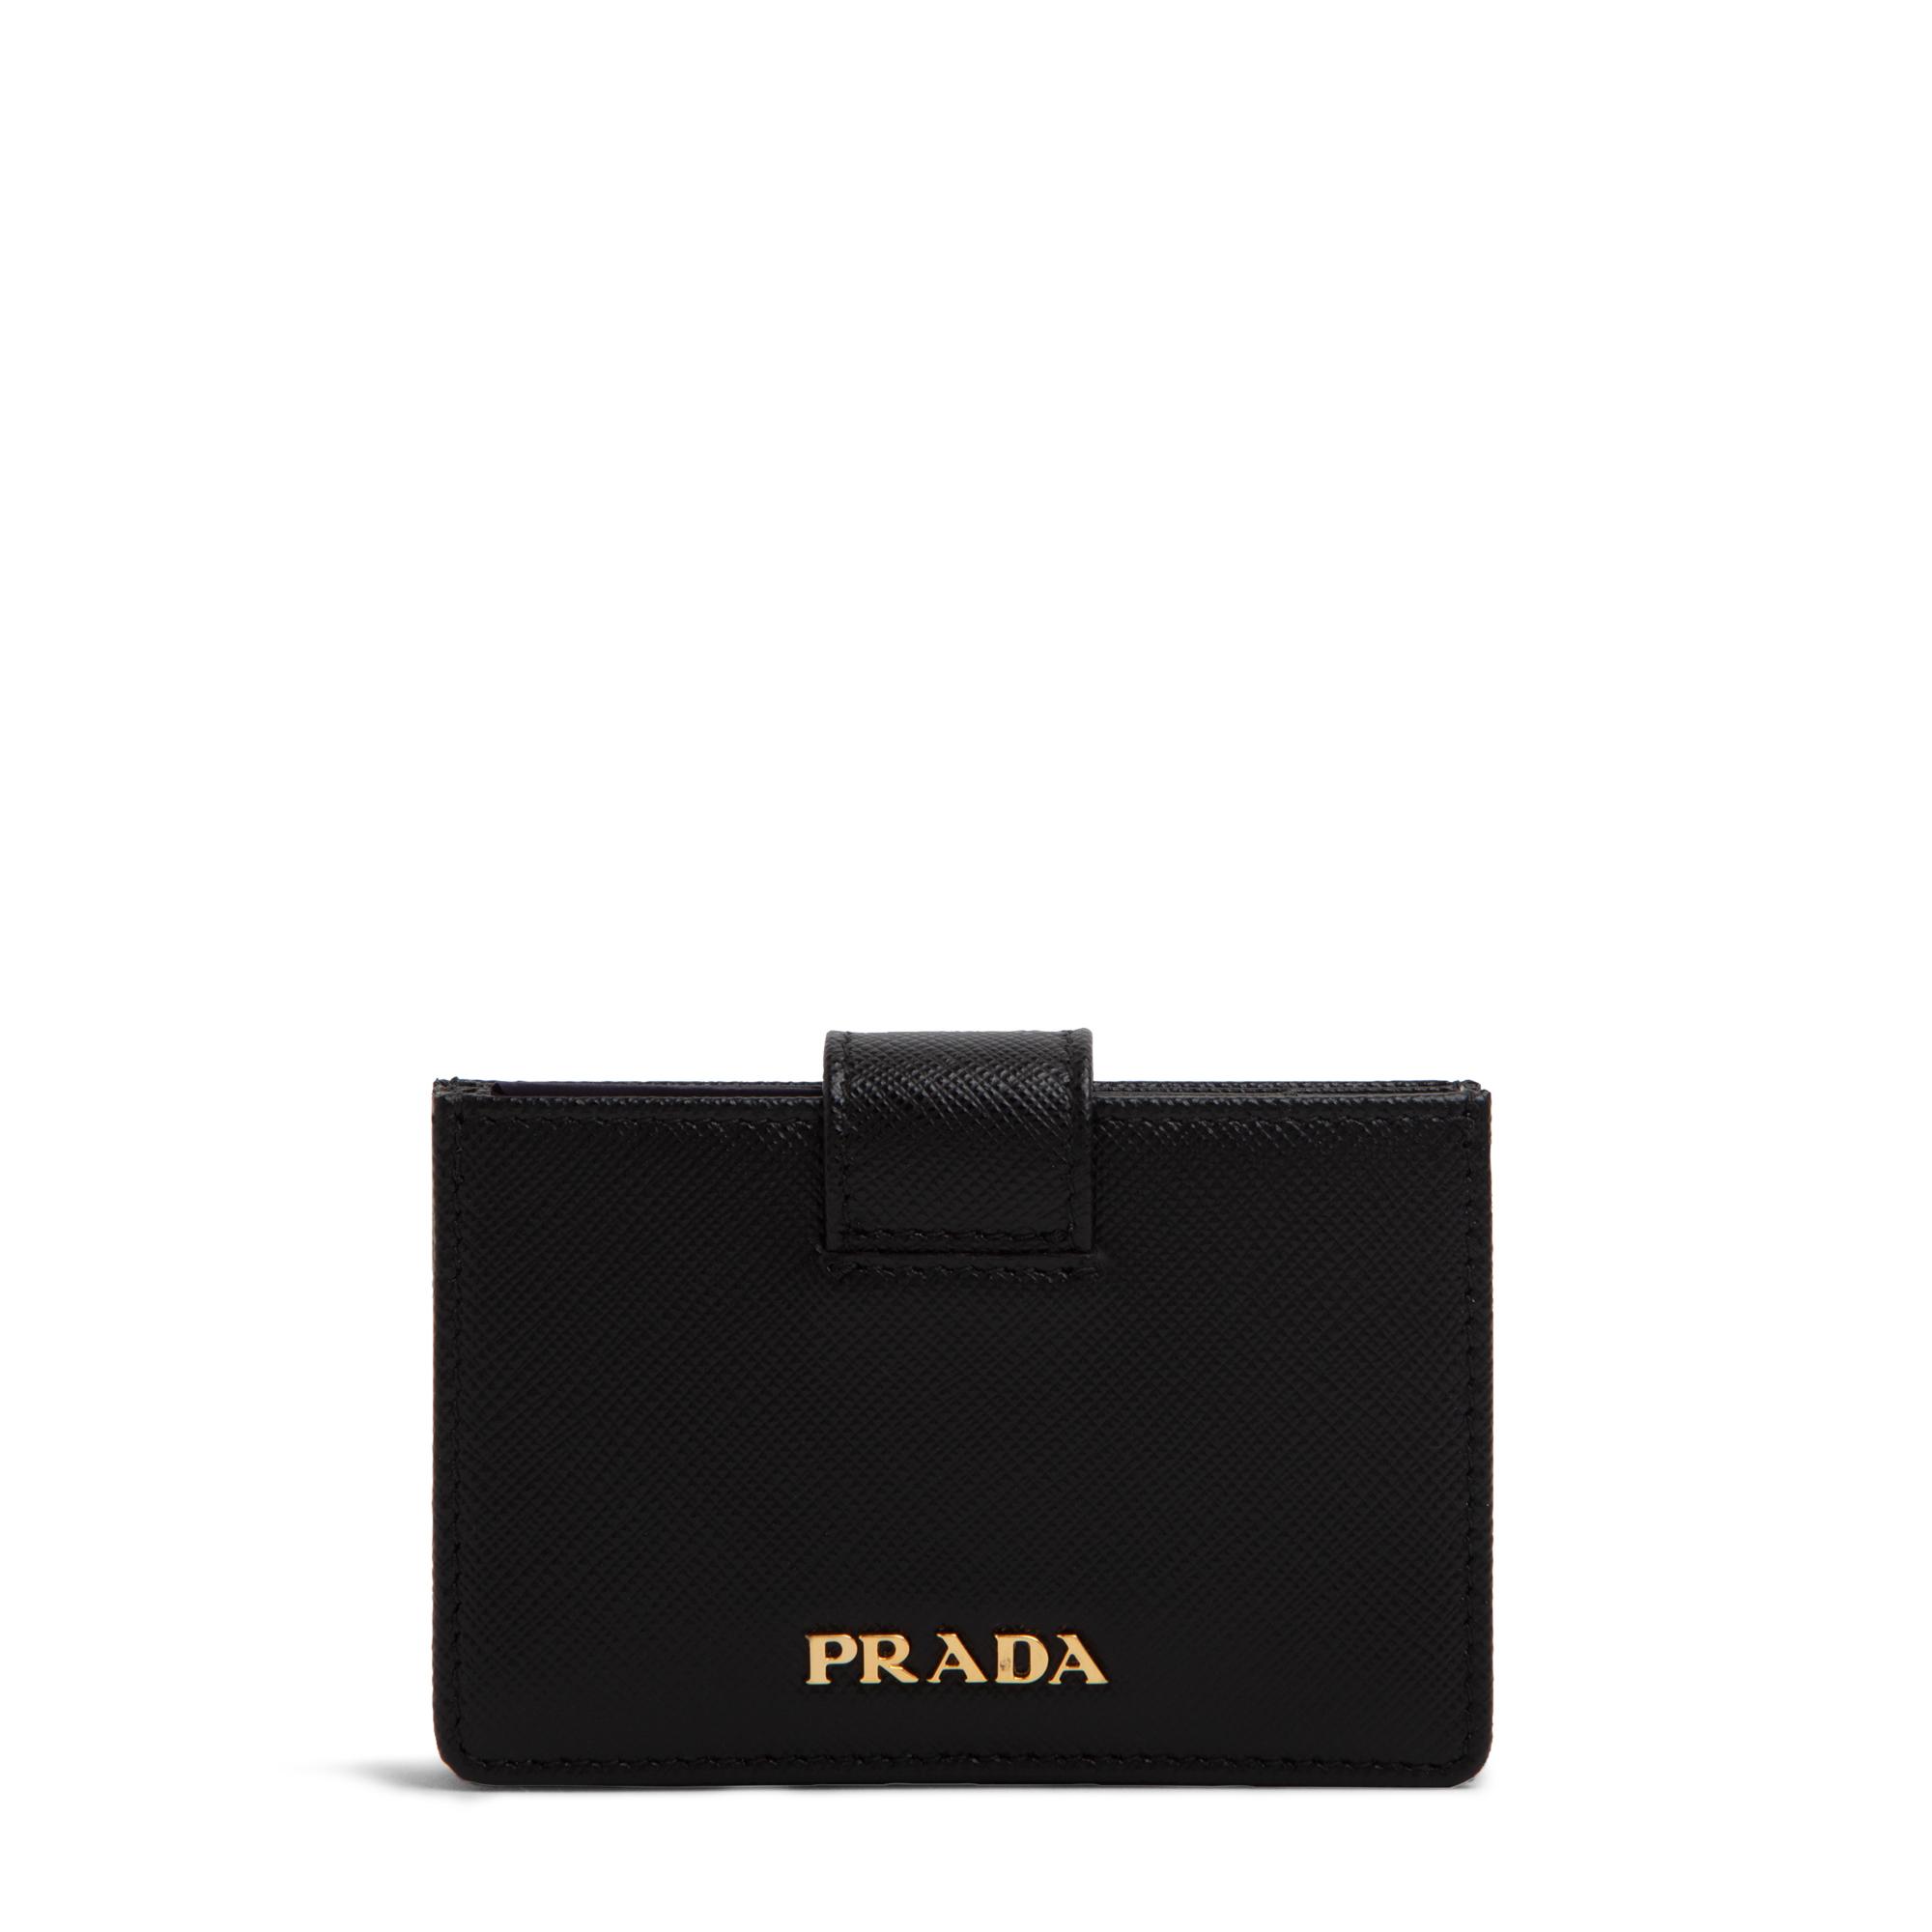 Saffiano leather card holder